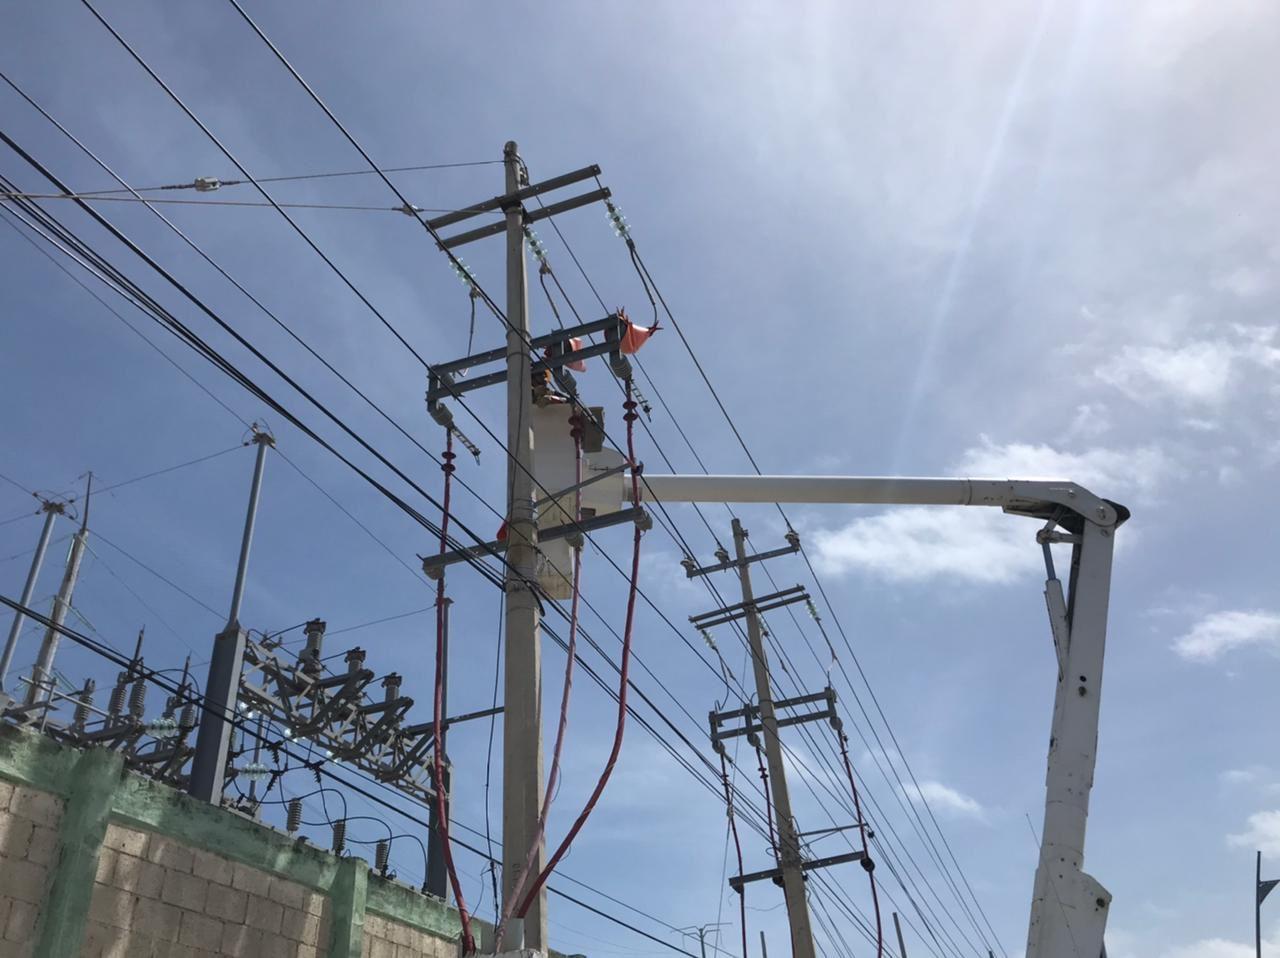 Restablecen suministro eléctrico en Playa del Carmen, Quintana Roo